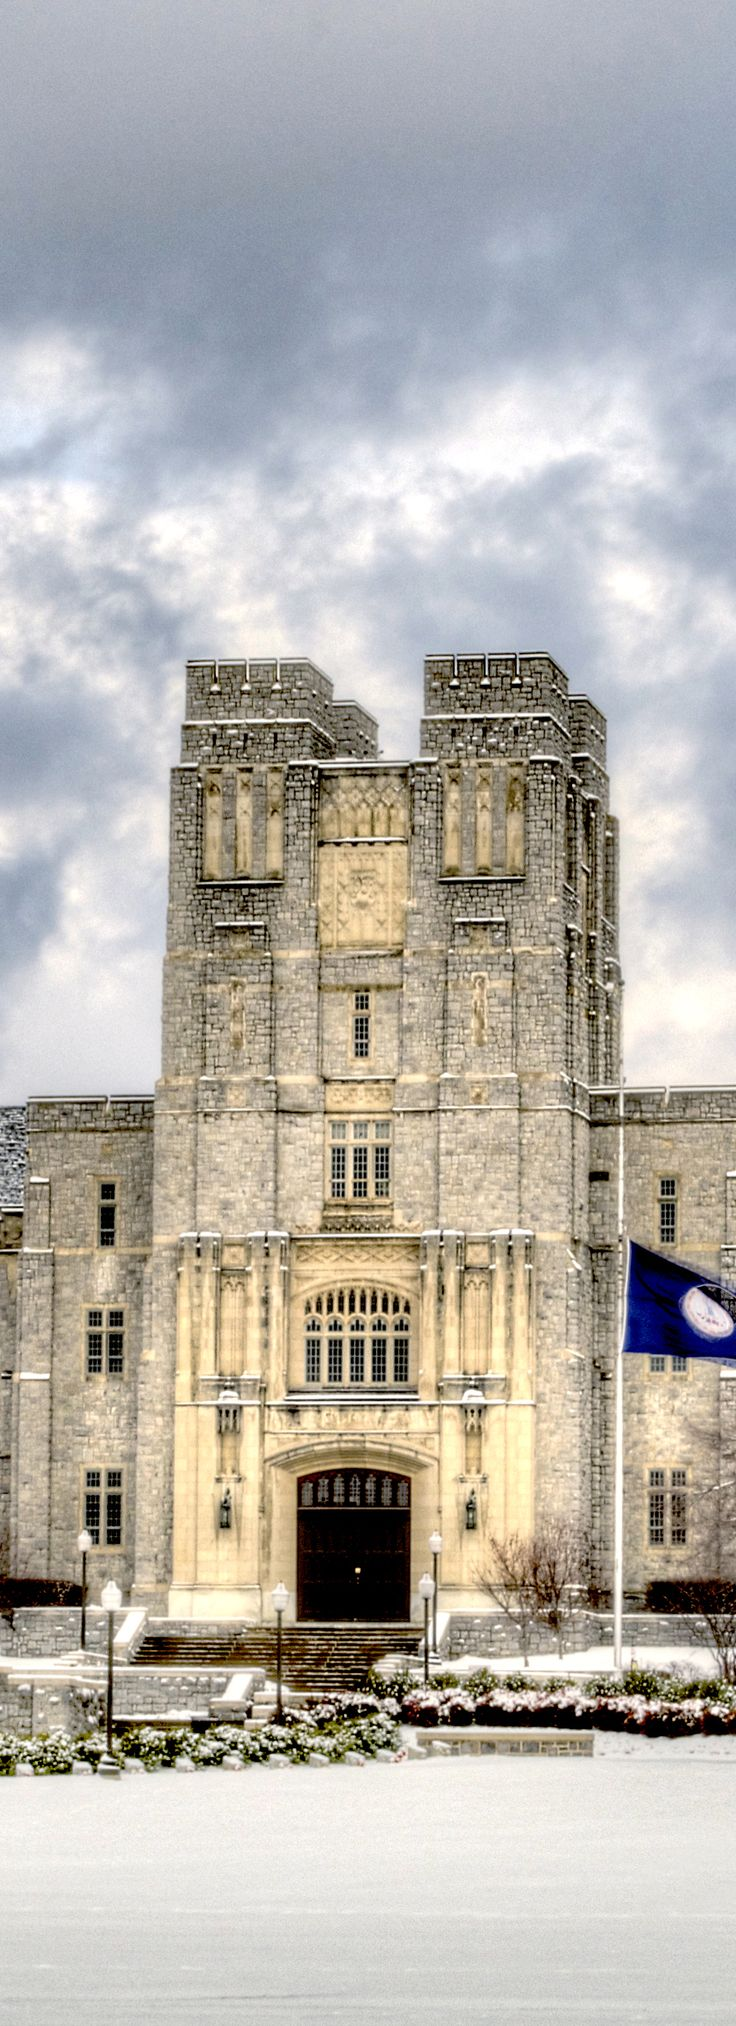 WOW-my school is beautiful Burruss Hall at Virginia Tech in winter, Blacksburg, VA, Photo by Peter Means